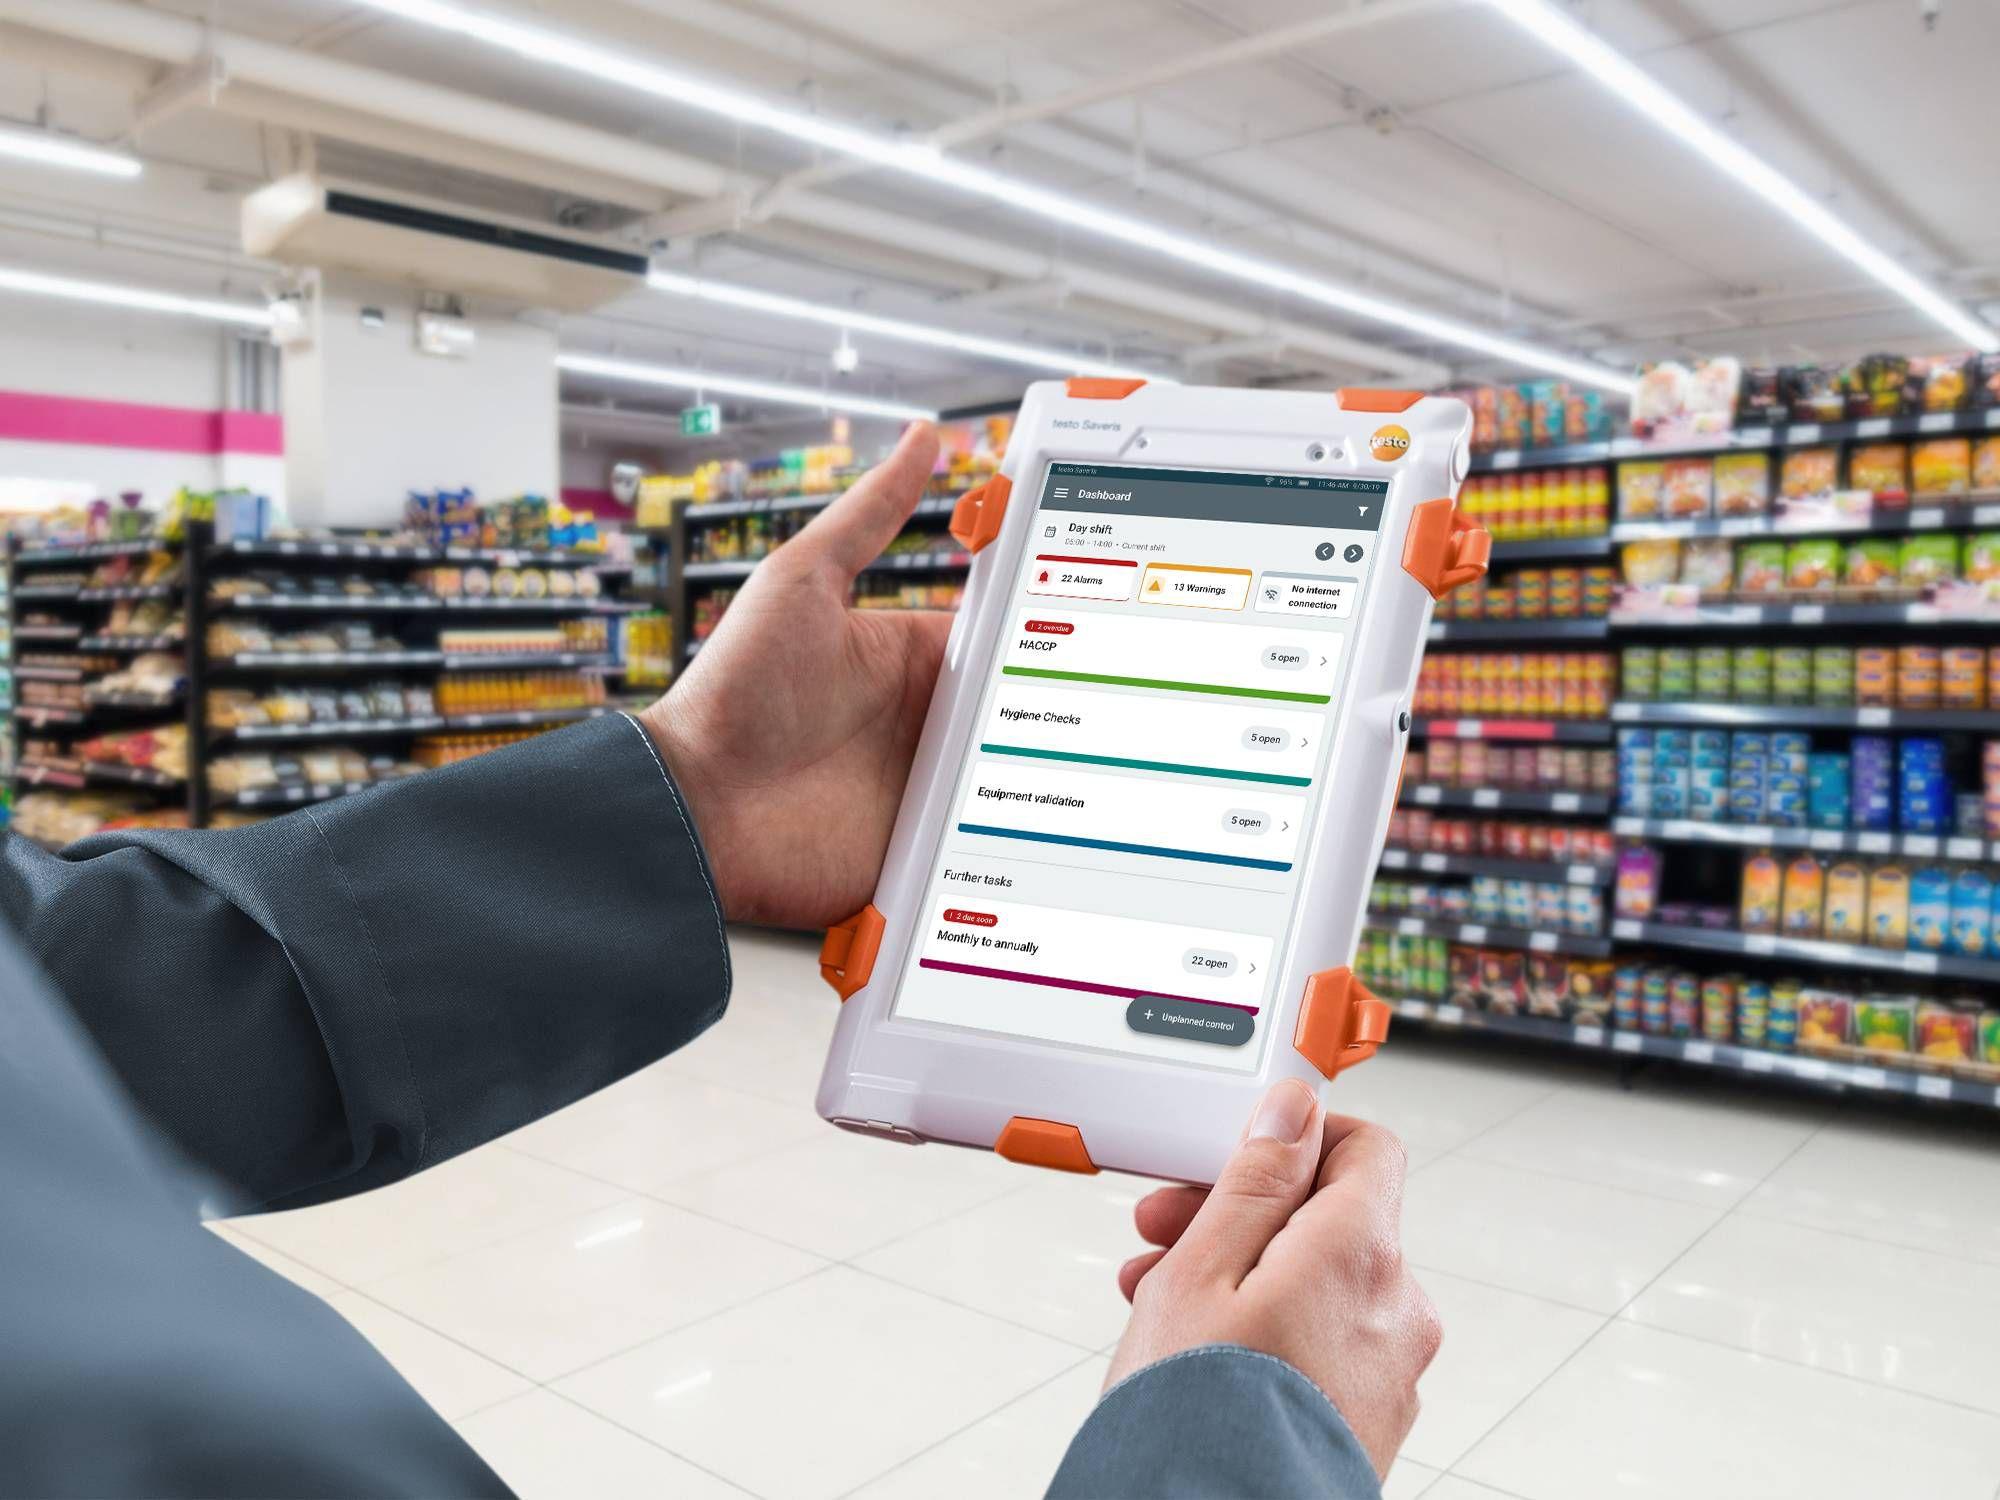 Оптимизация процессов в супермаркете